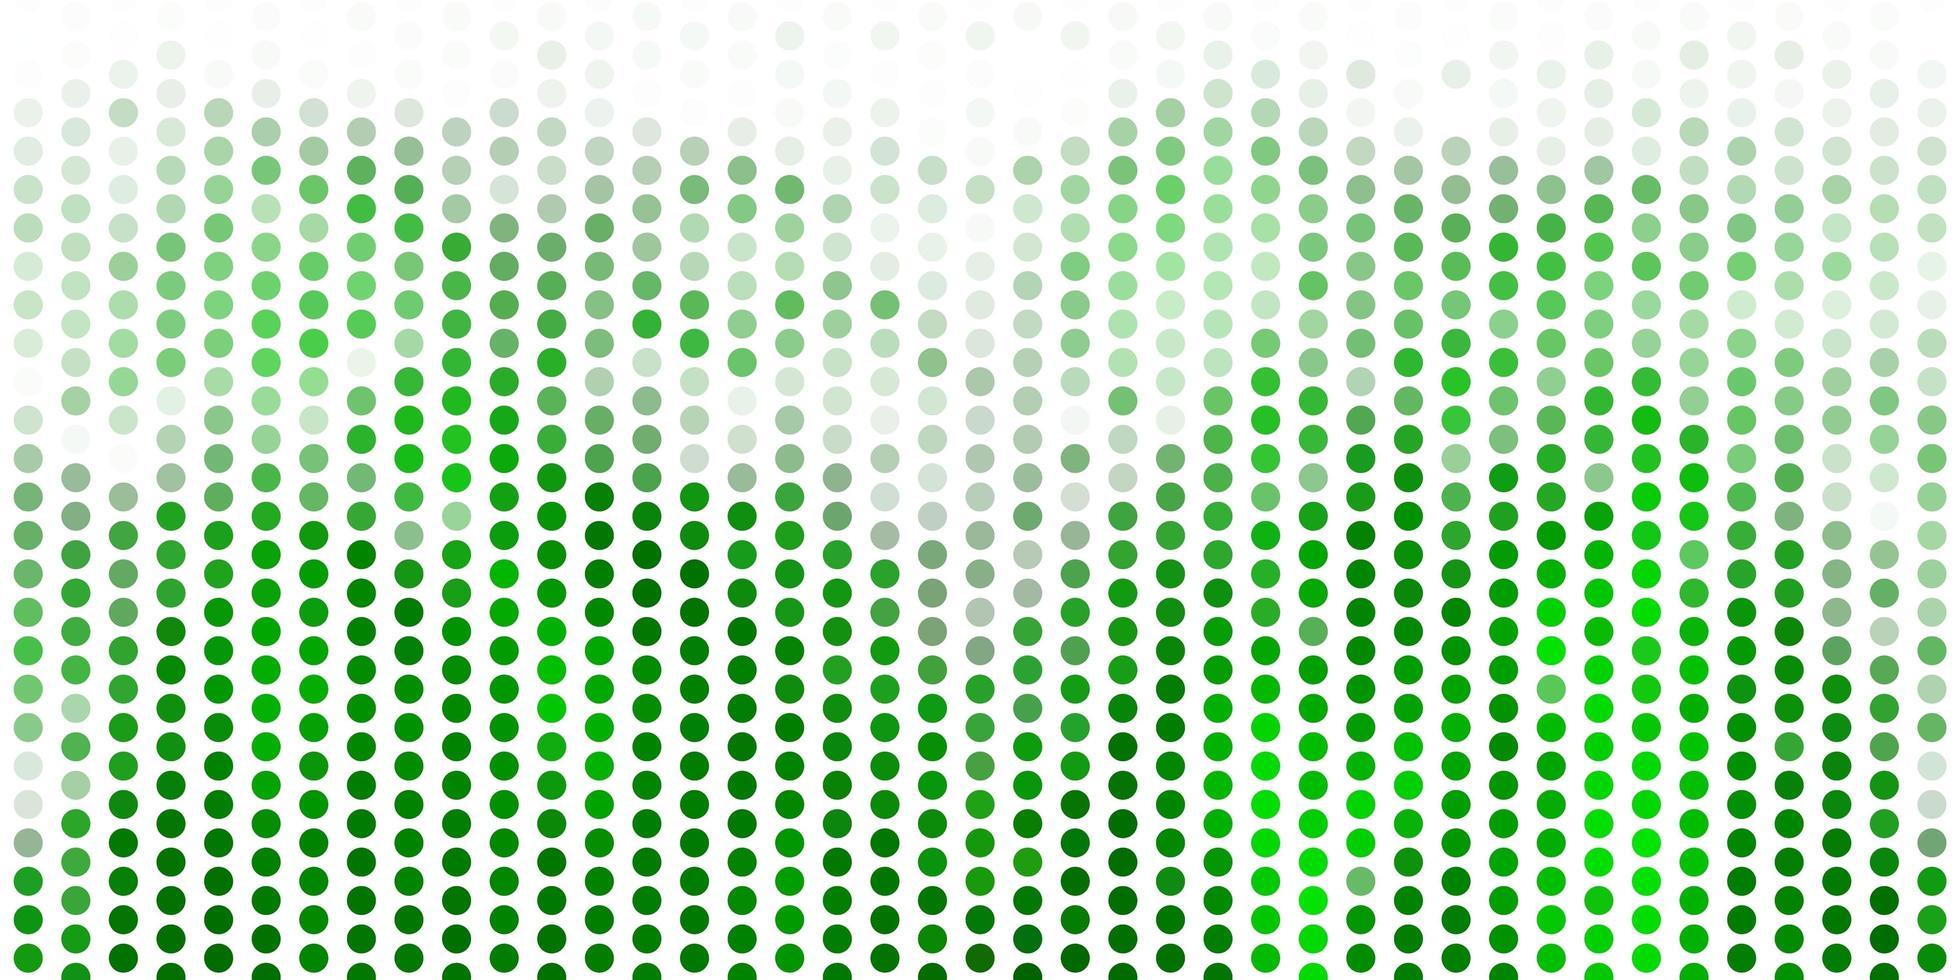 hellgrünes Vektorlayout mit Kreisformen. vektor